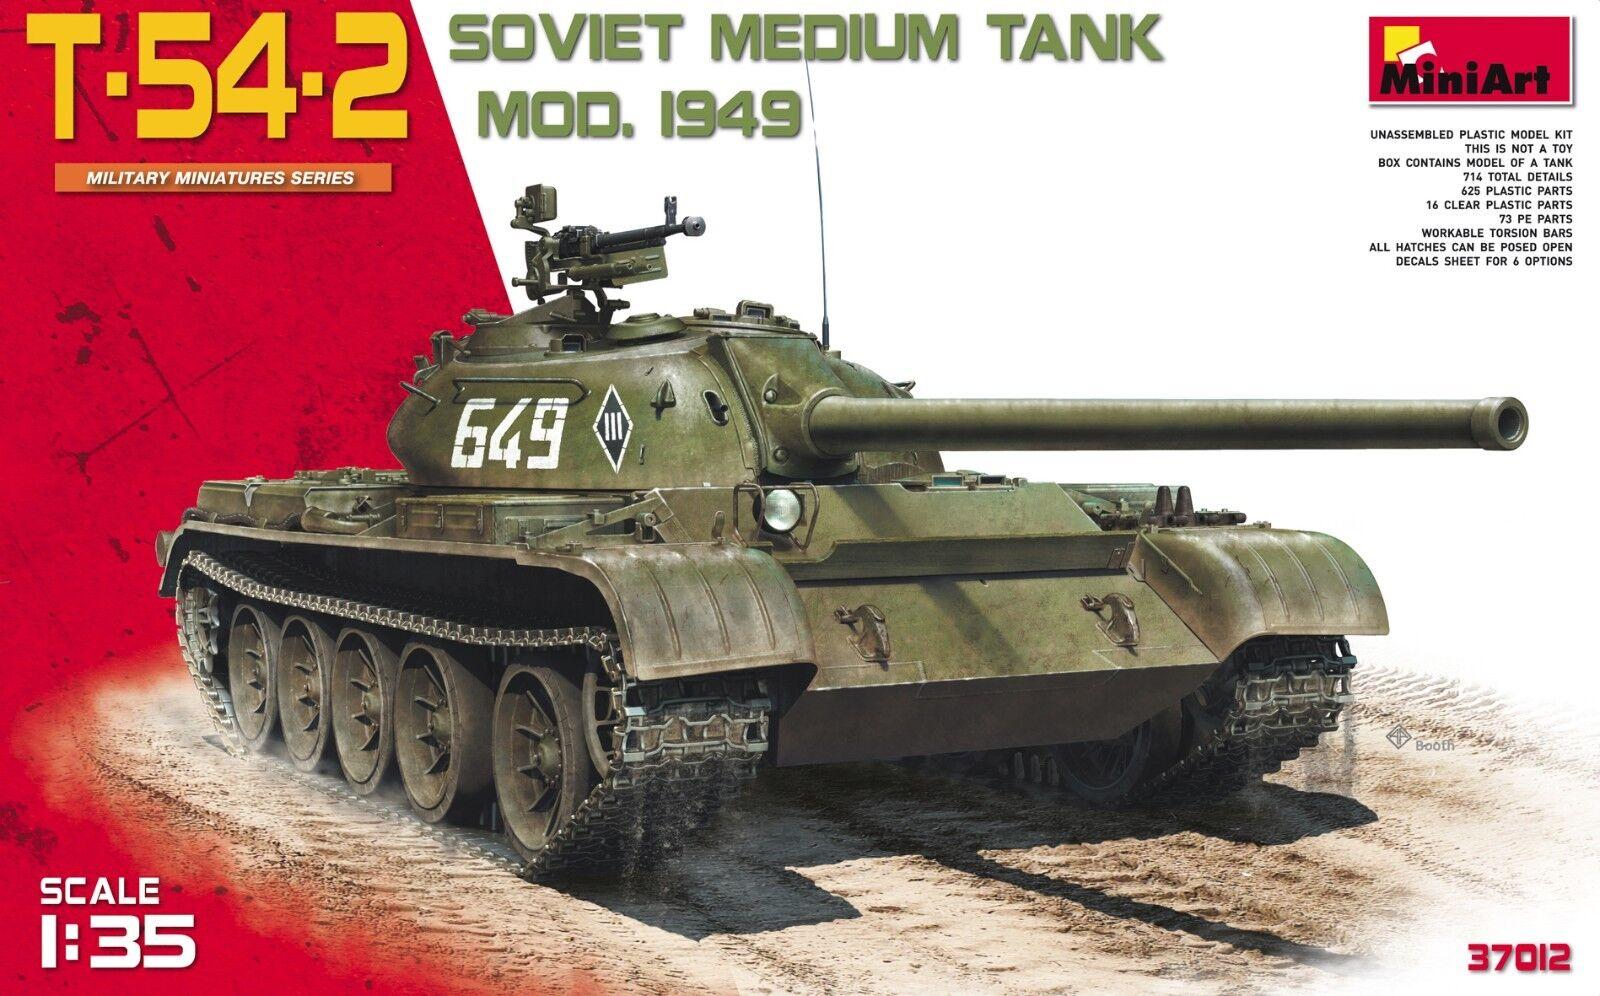 T-54-2 SOVIET MEDIUM TANK. Mod 1949 1 35 Miniart 37012